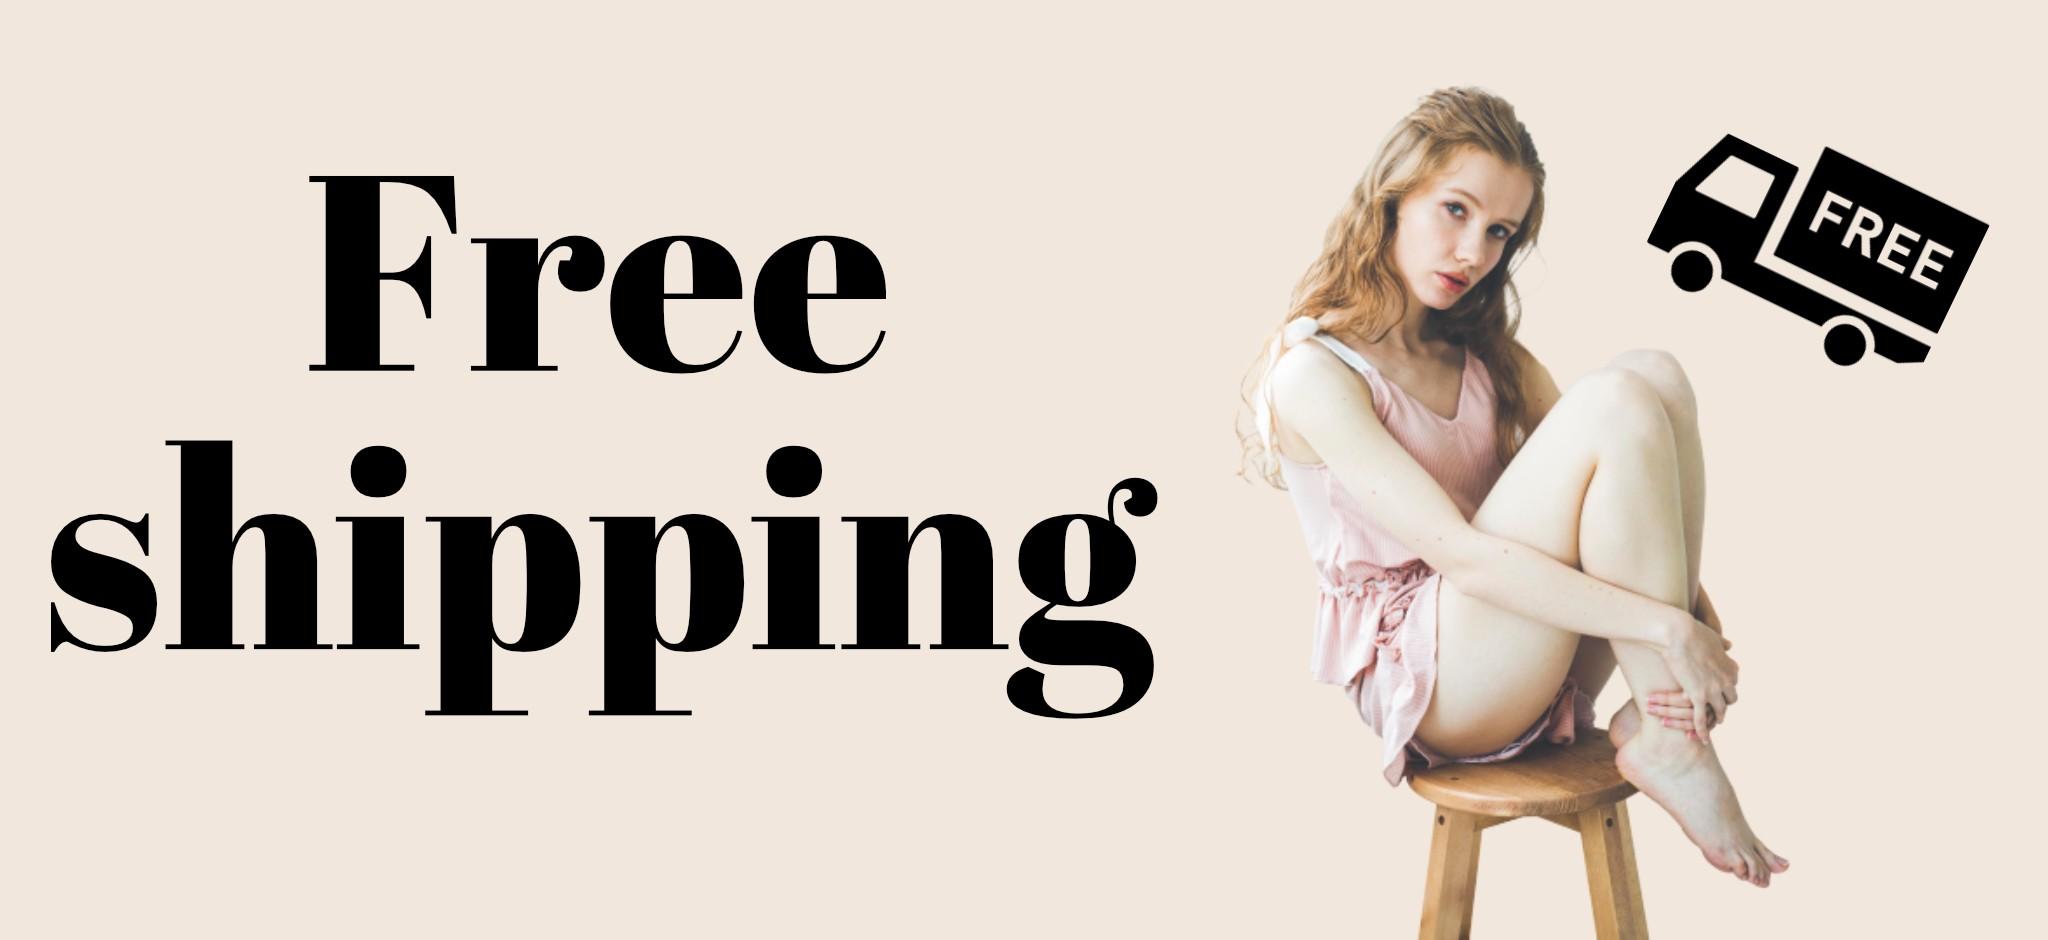 【Information】Free shipping!増税前のおまとめ買いのチャンス